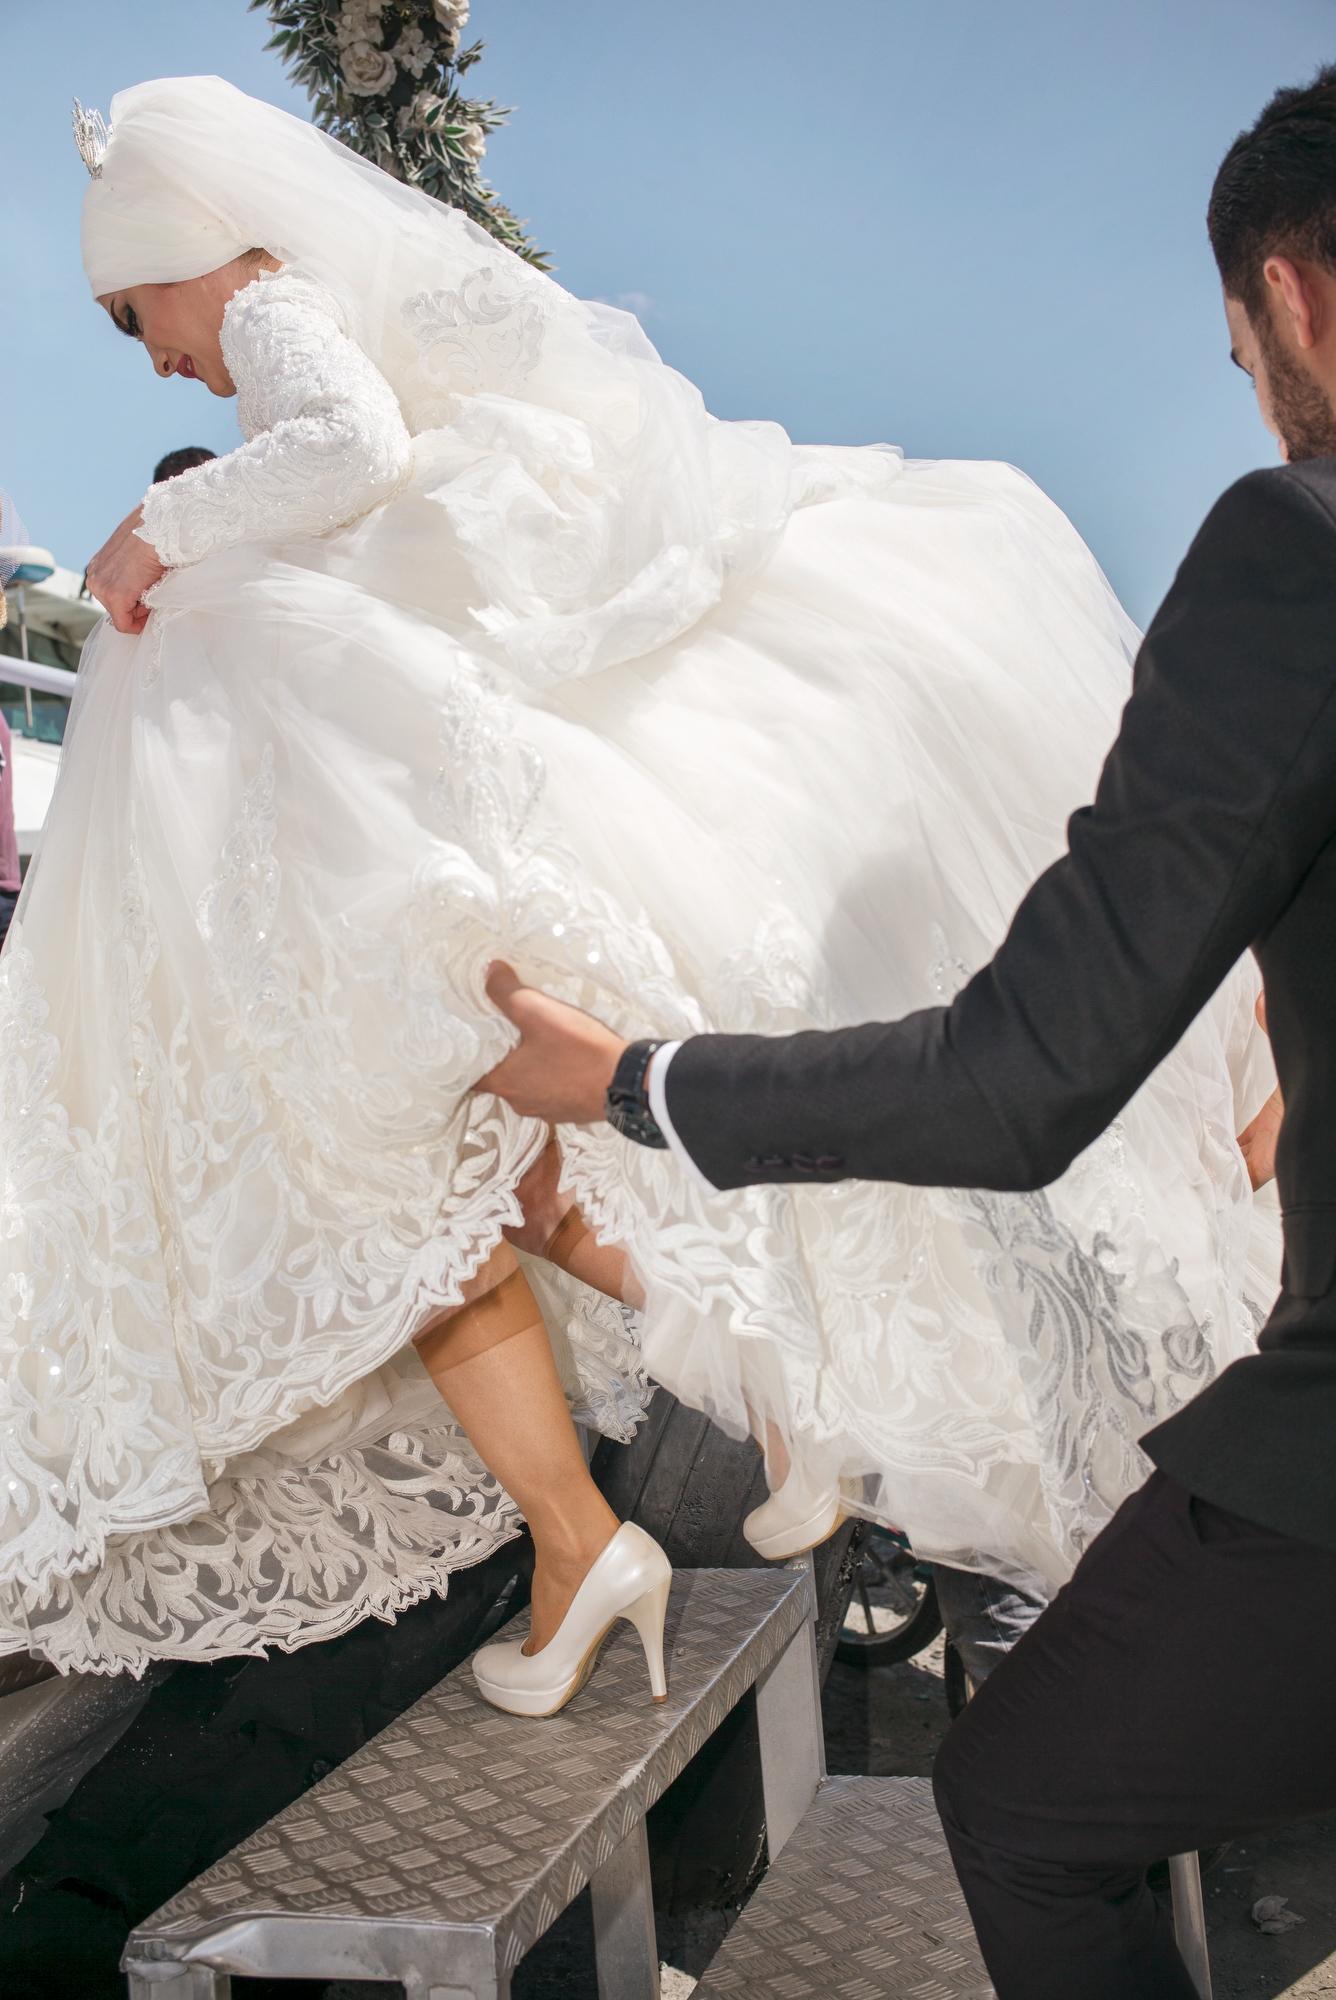 fot. Jean-Marc Caimi i Valentina Piccinni